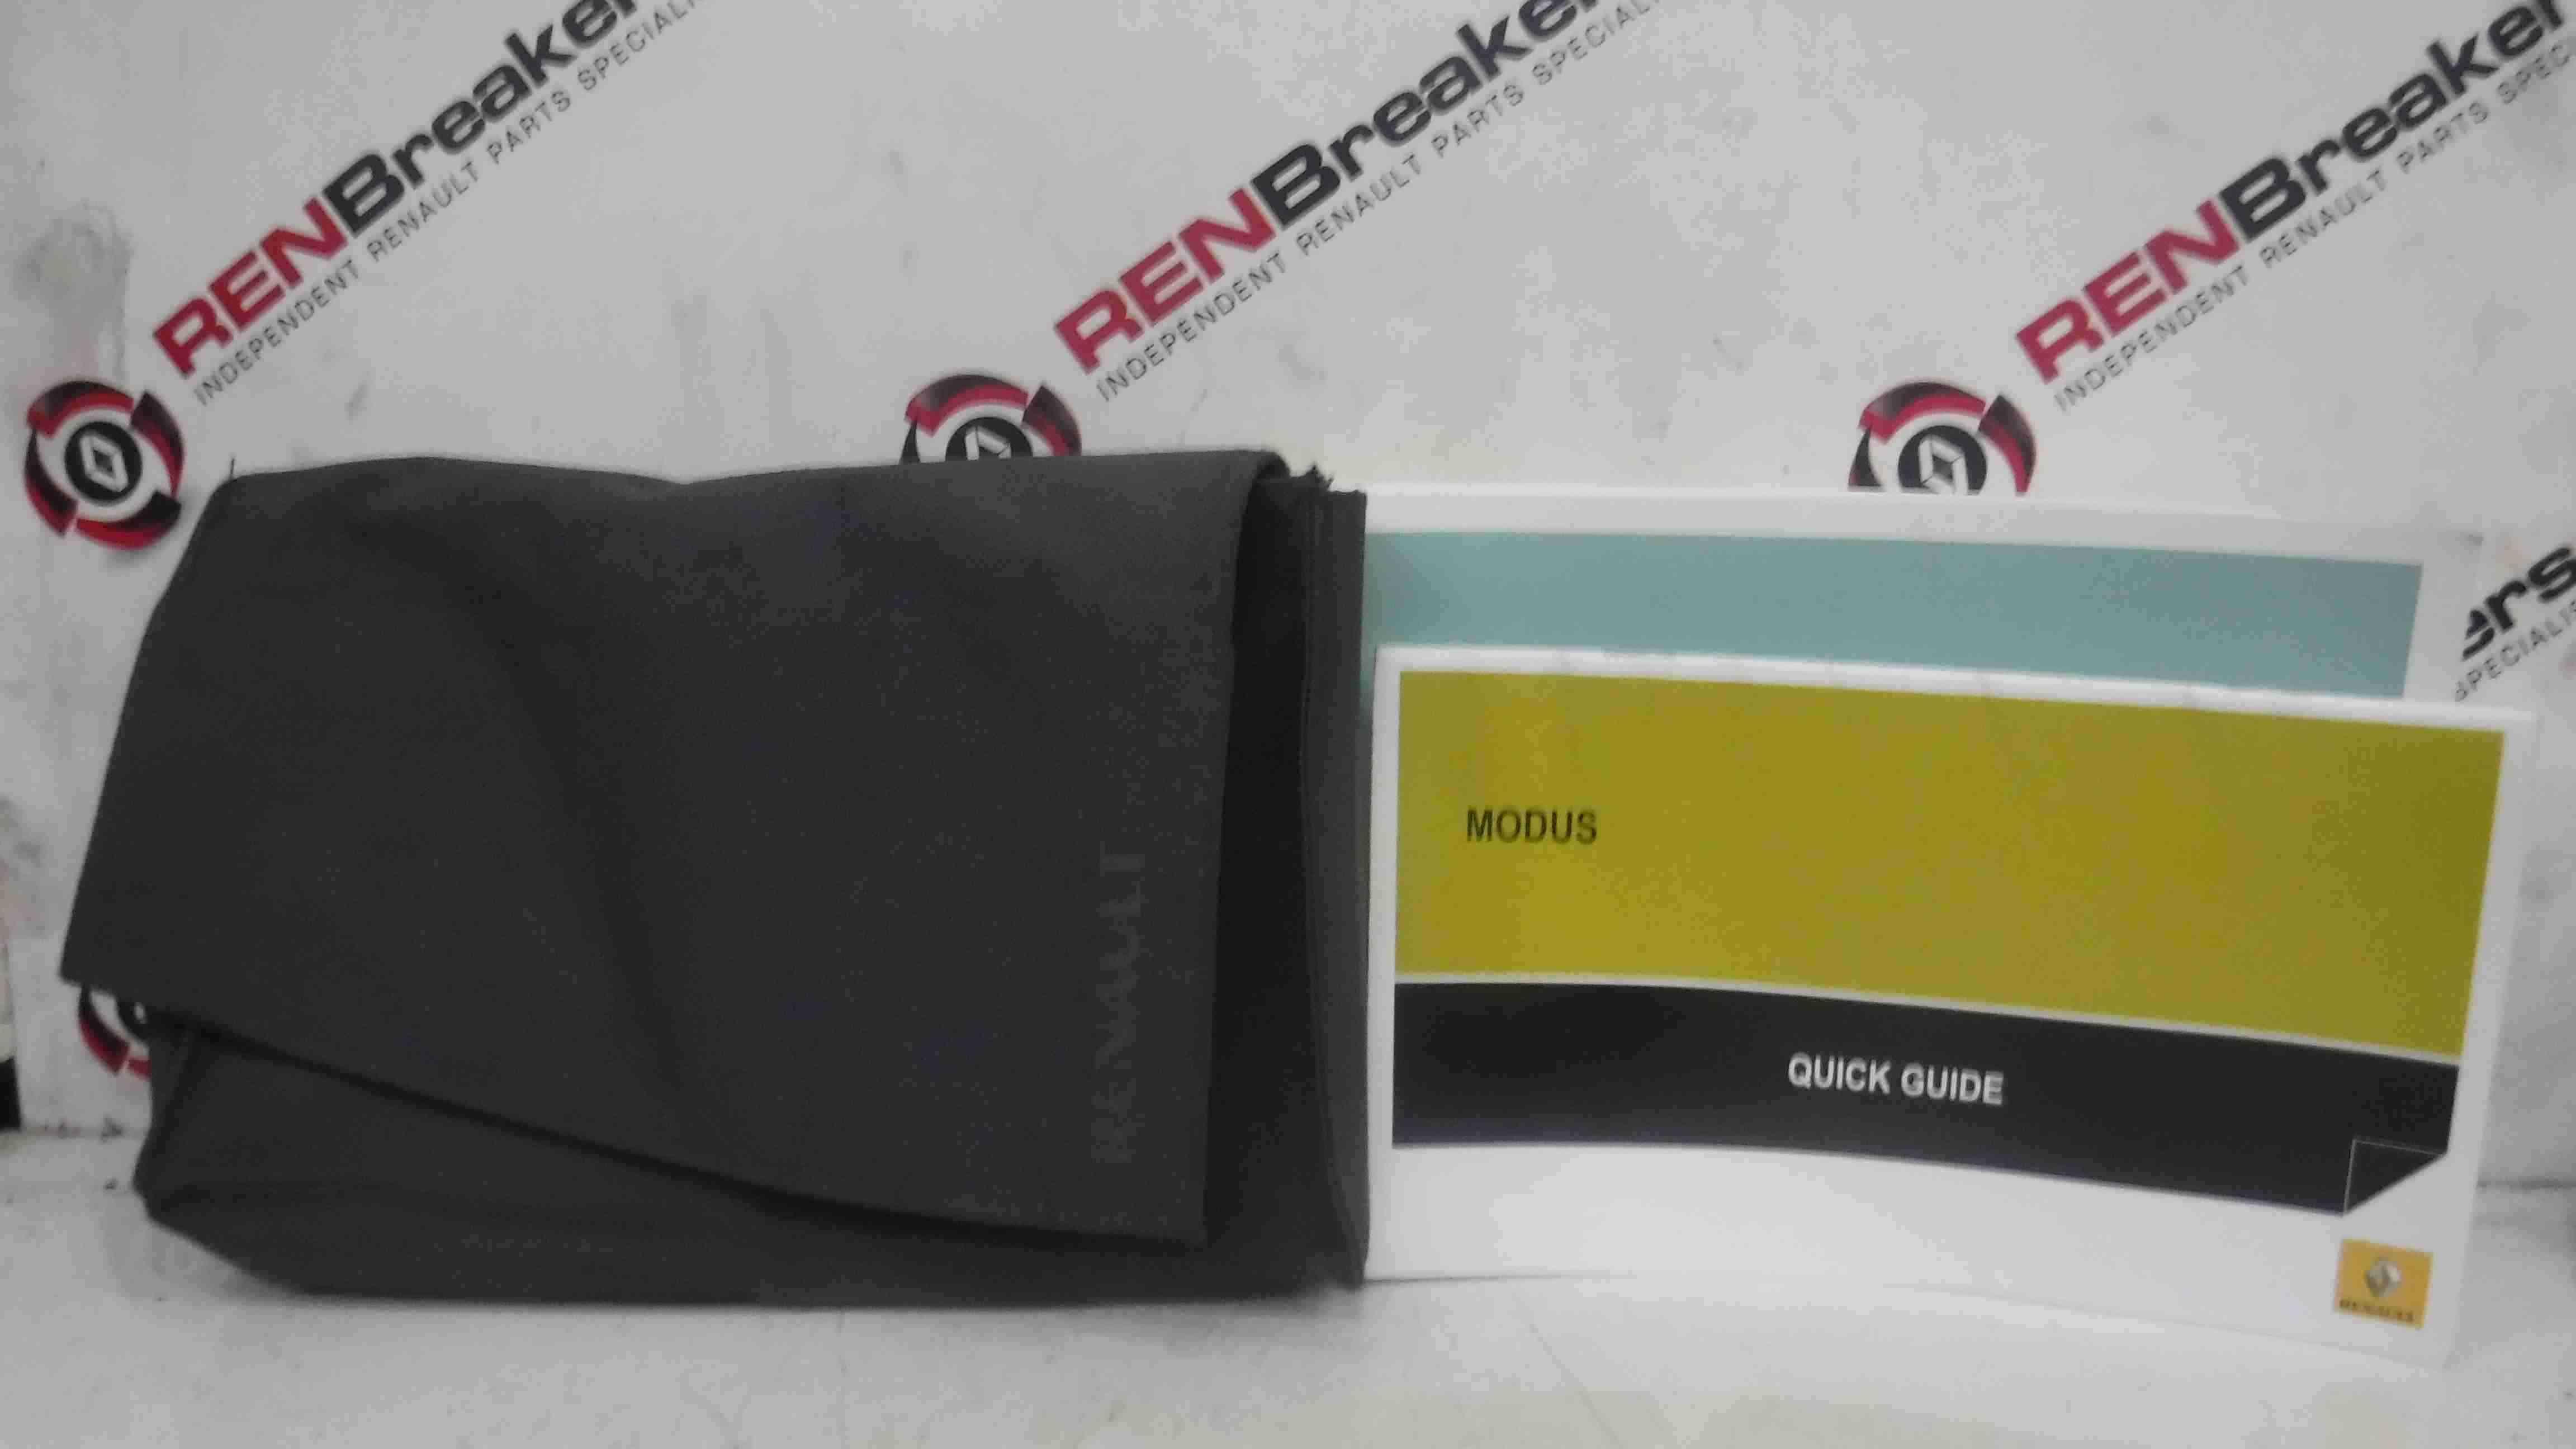 Renault Modus 2004-2008 Handbook Documents Guide + Wallet Holder